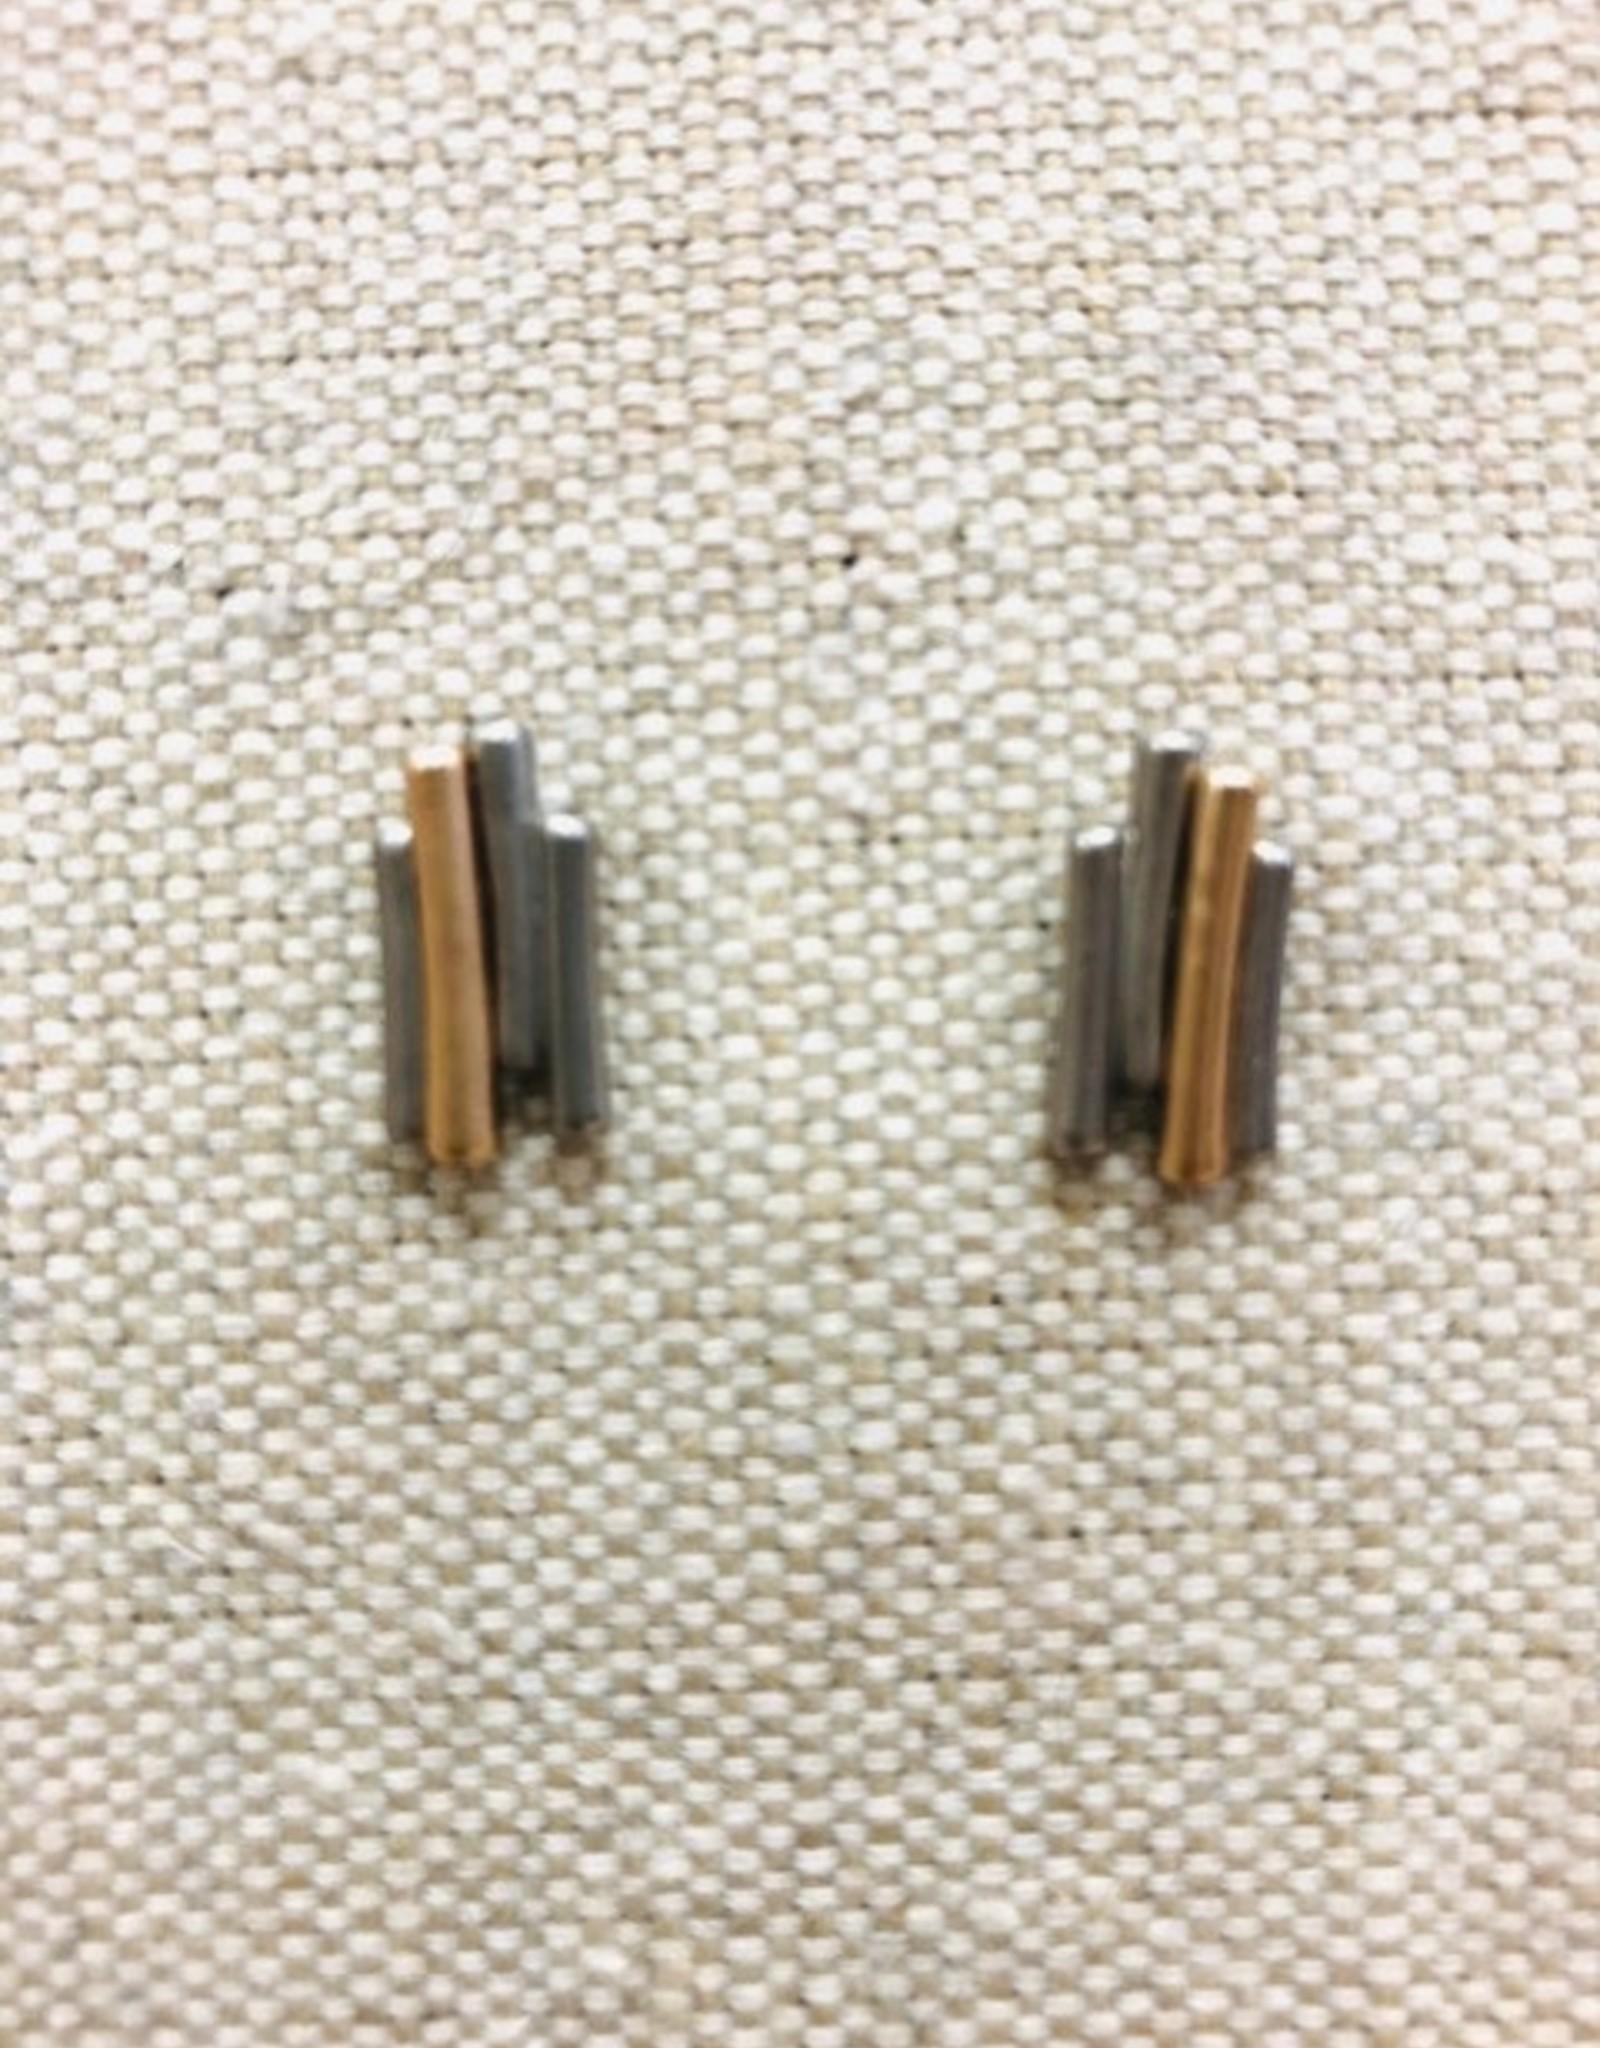 Two Color Bar Earrings